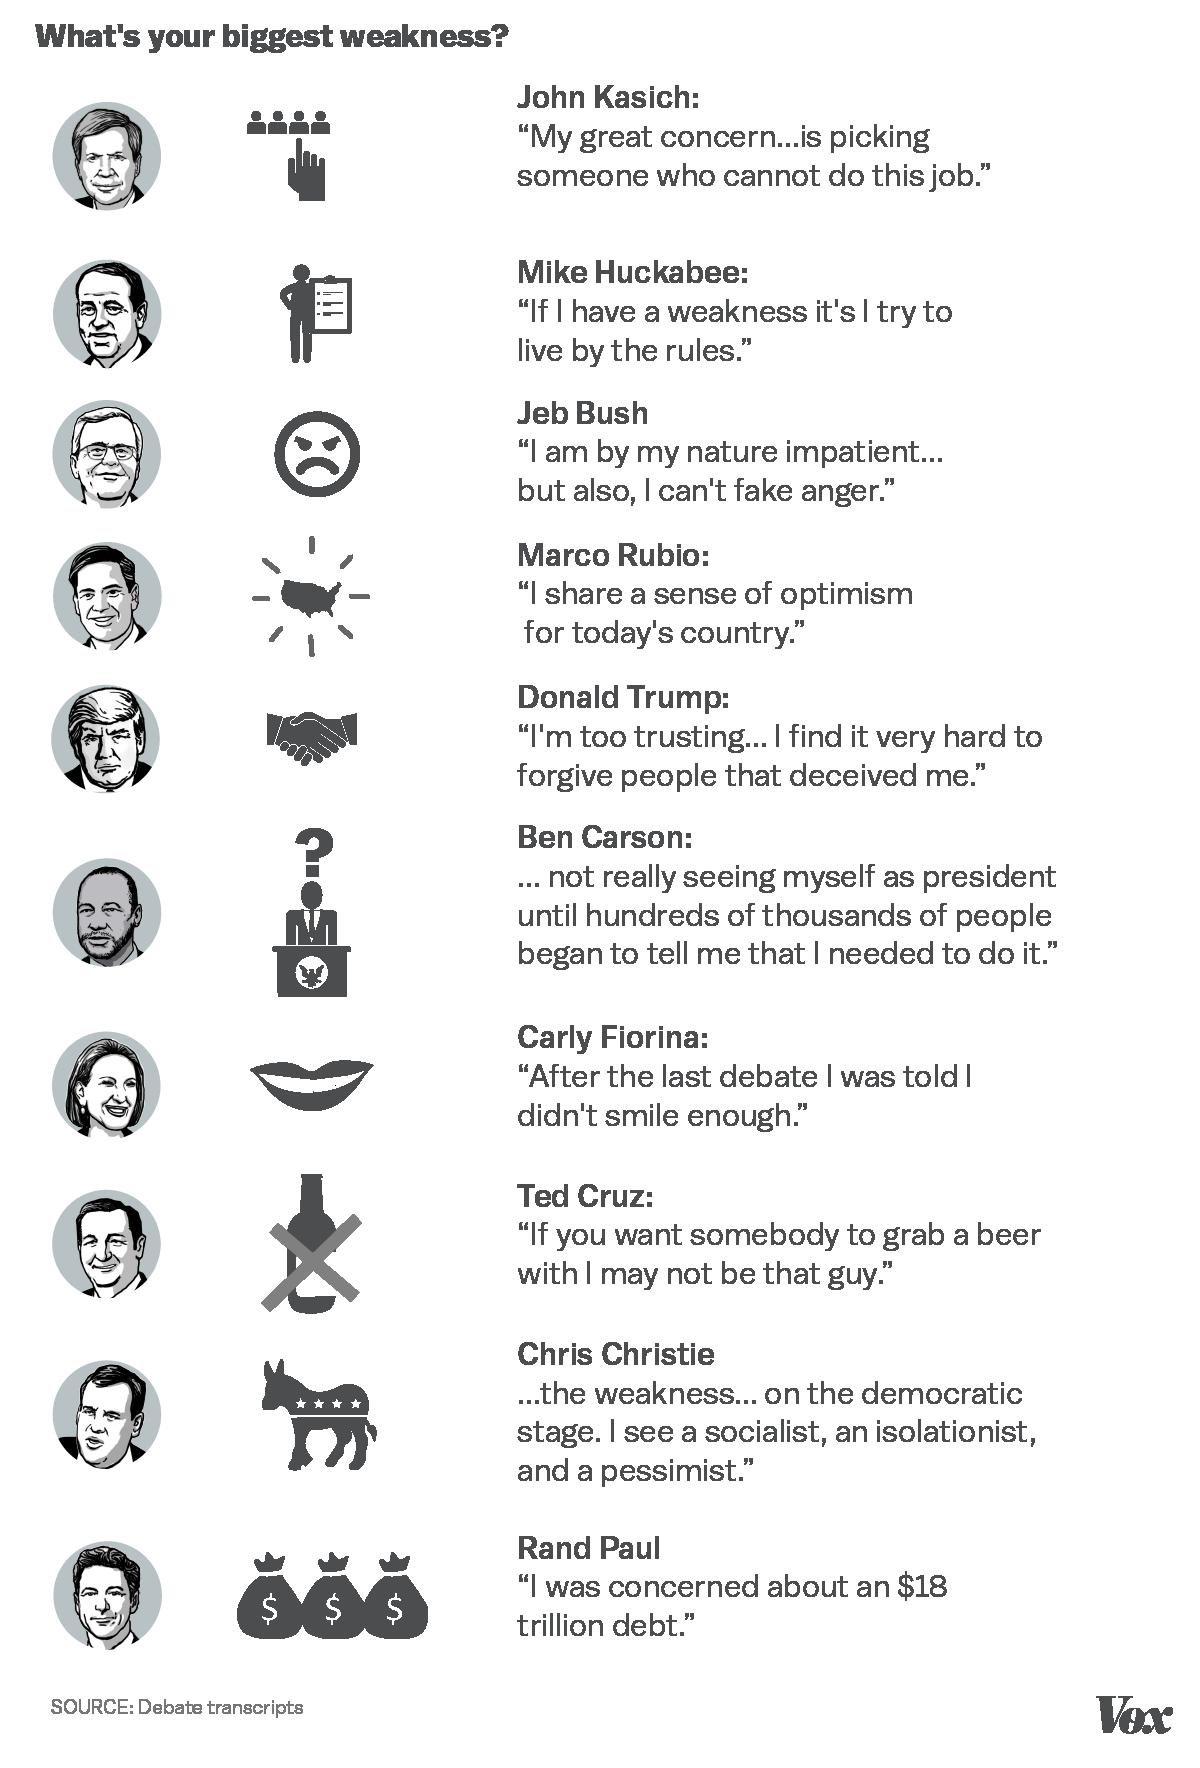 Republican debate answers on their biggest weaknesses.